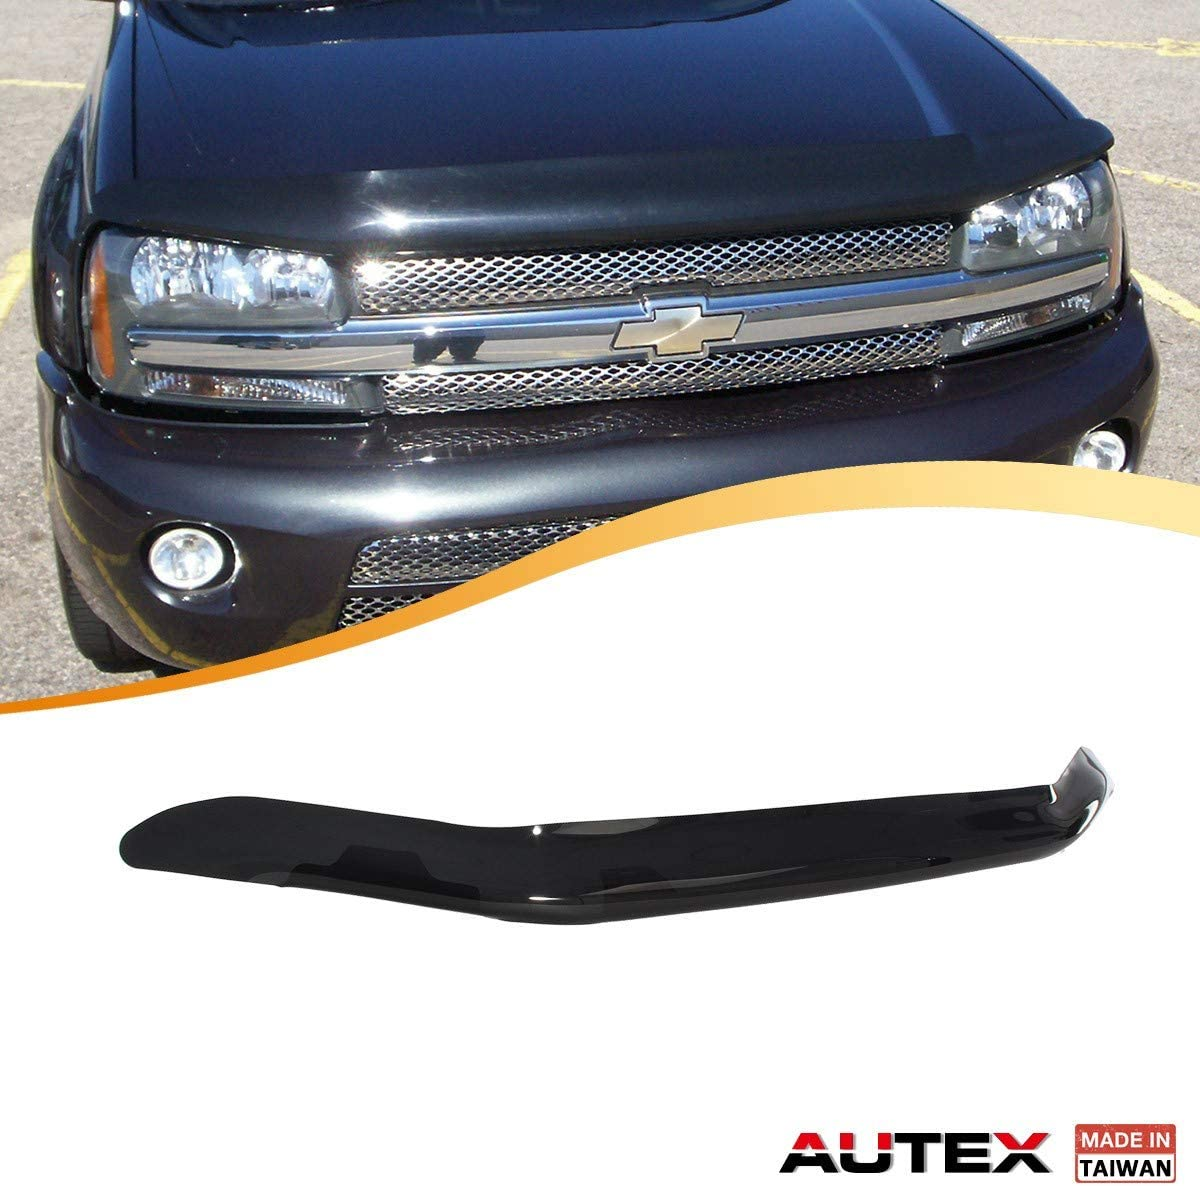 For Chevy Trailblazer 2002-2007 Westin Platinum Smoke Bug Shield